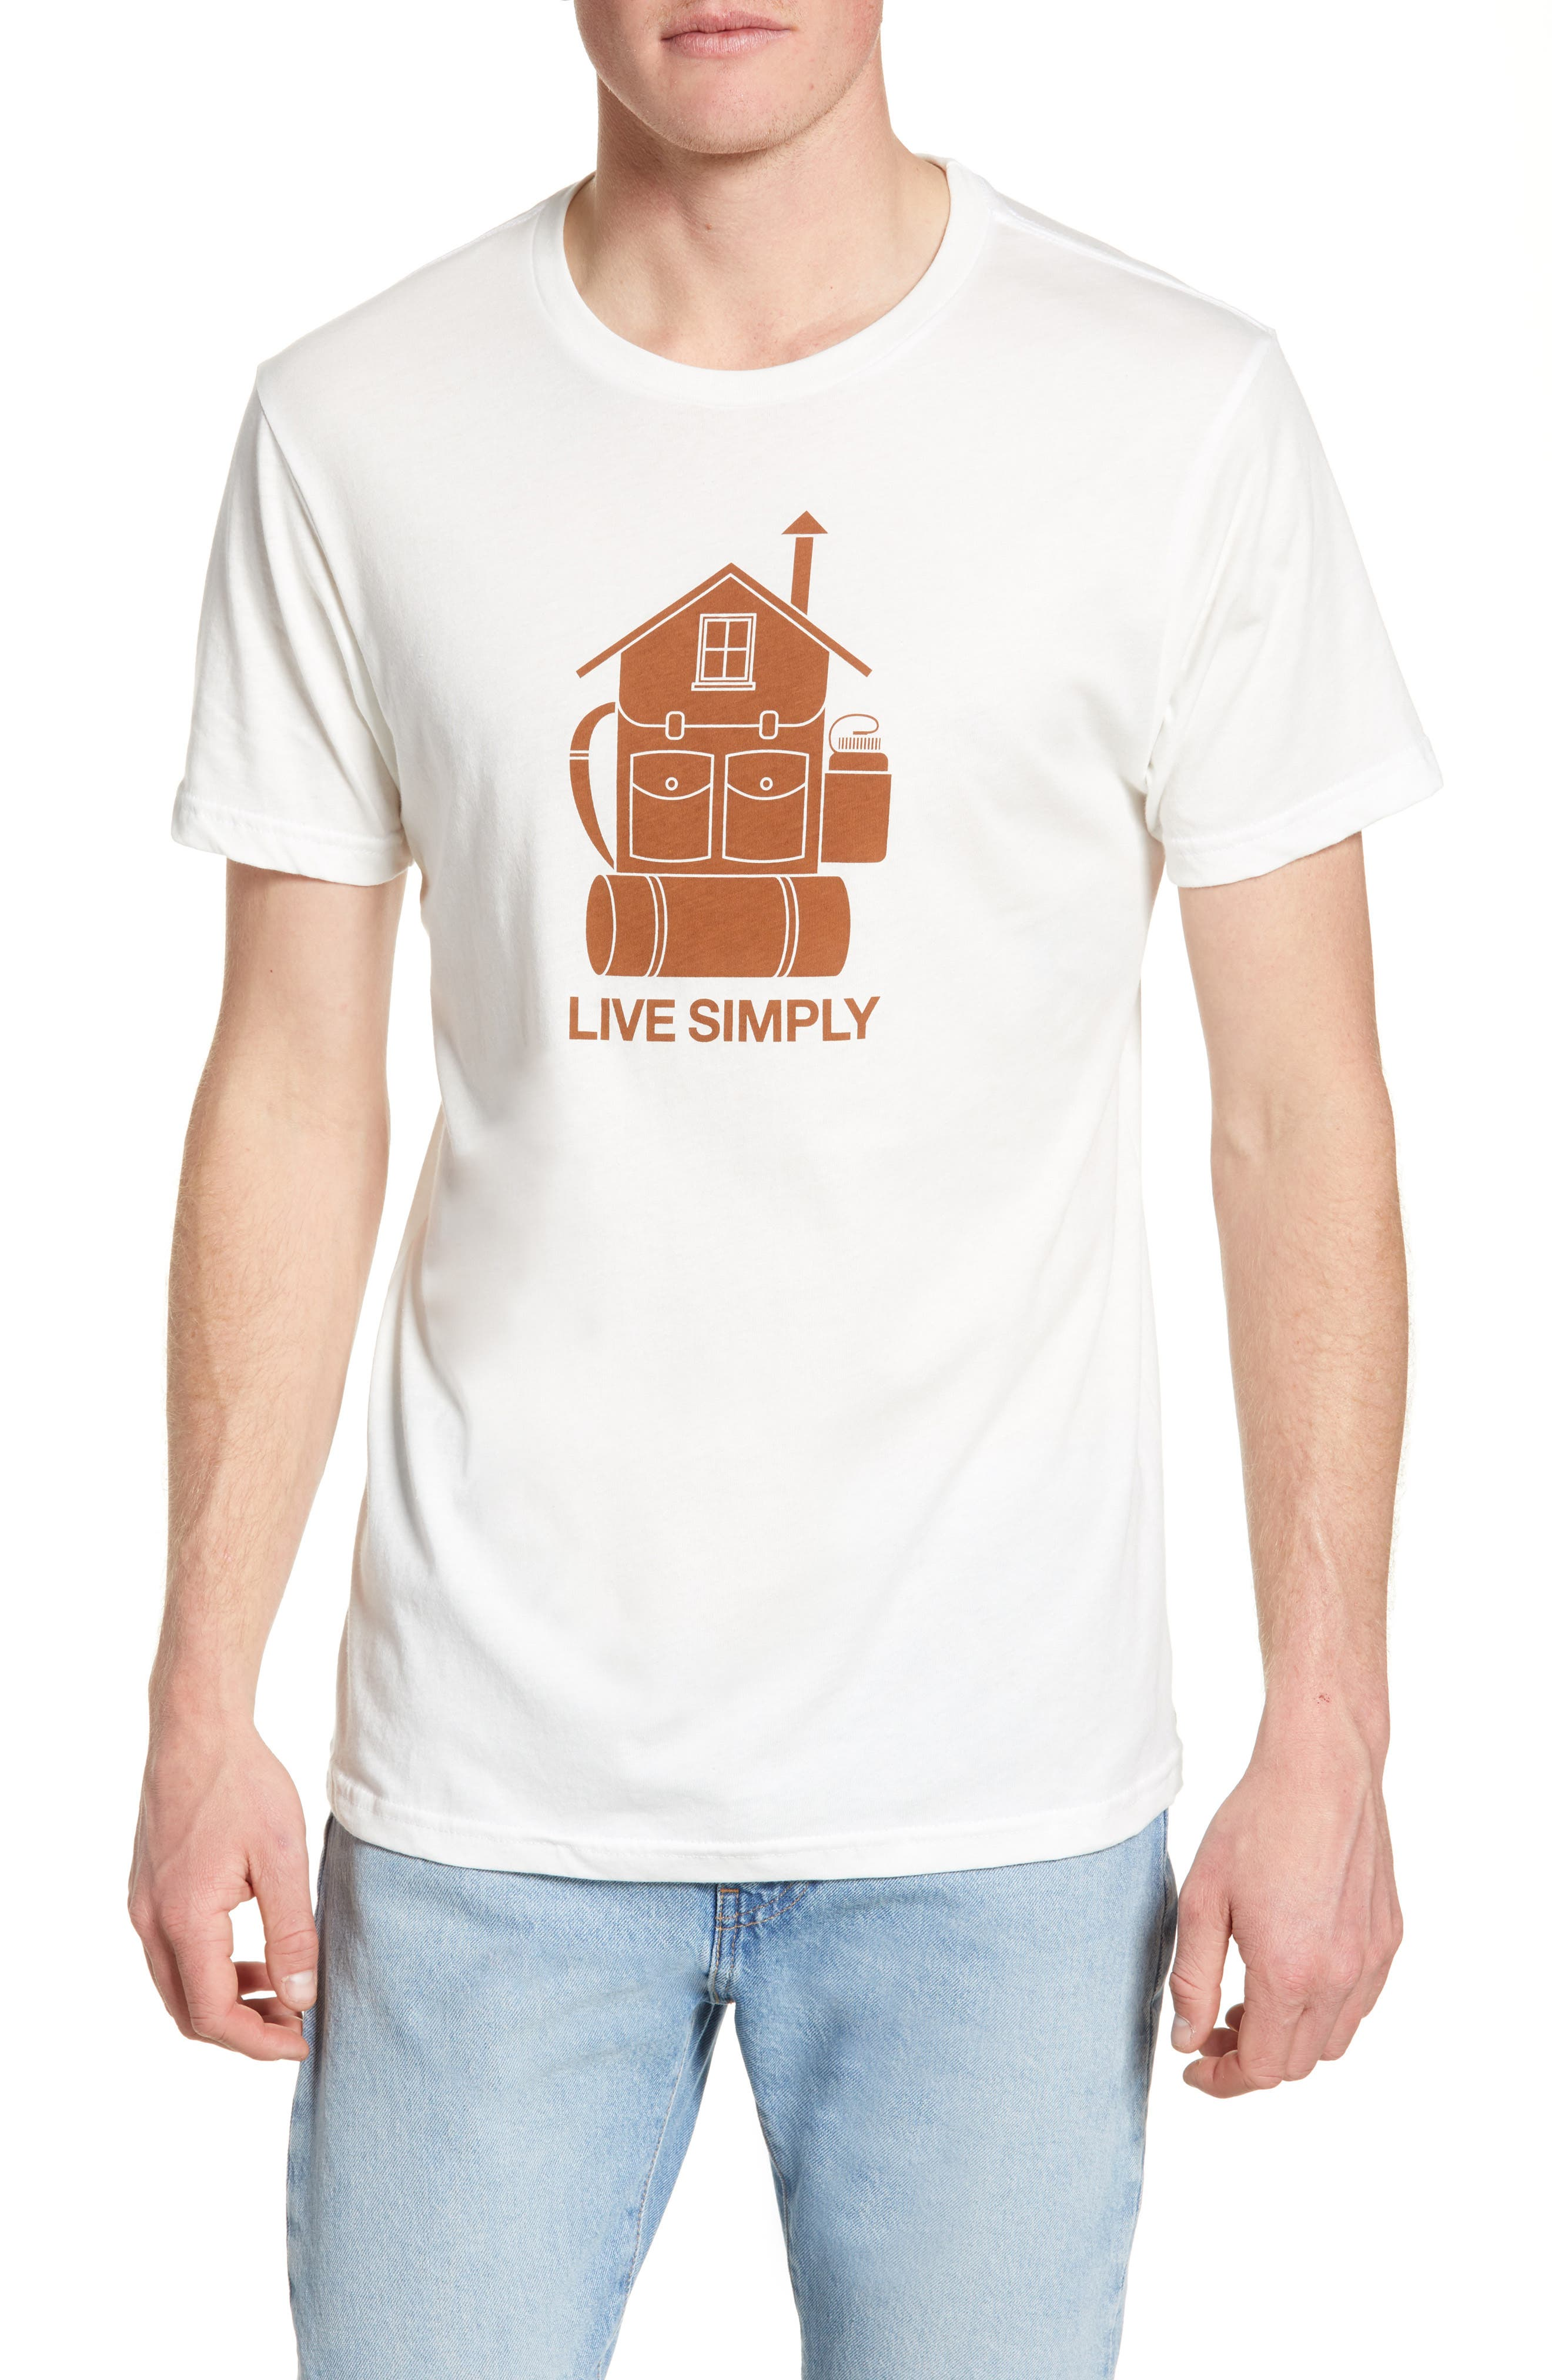 Patagonia Live Simply Home Graphic Organic Cotton T-Shirt, White